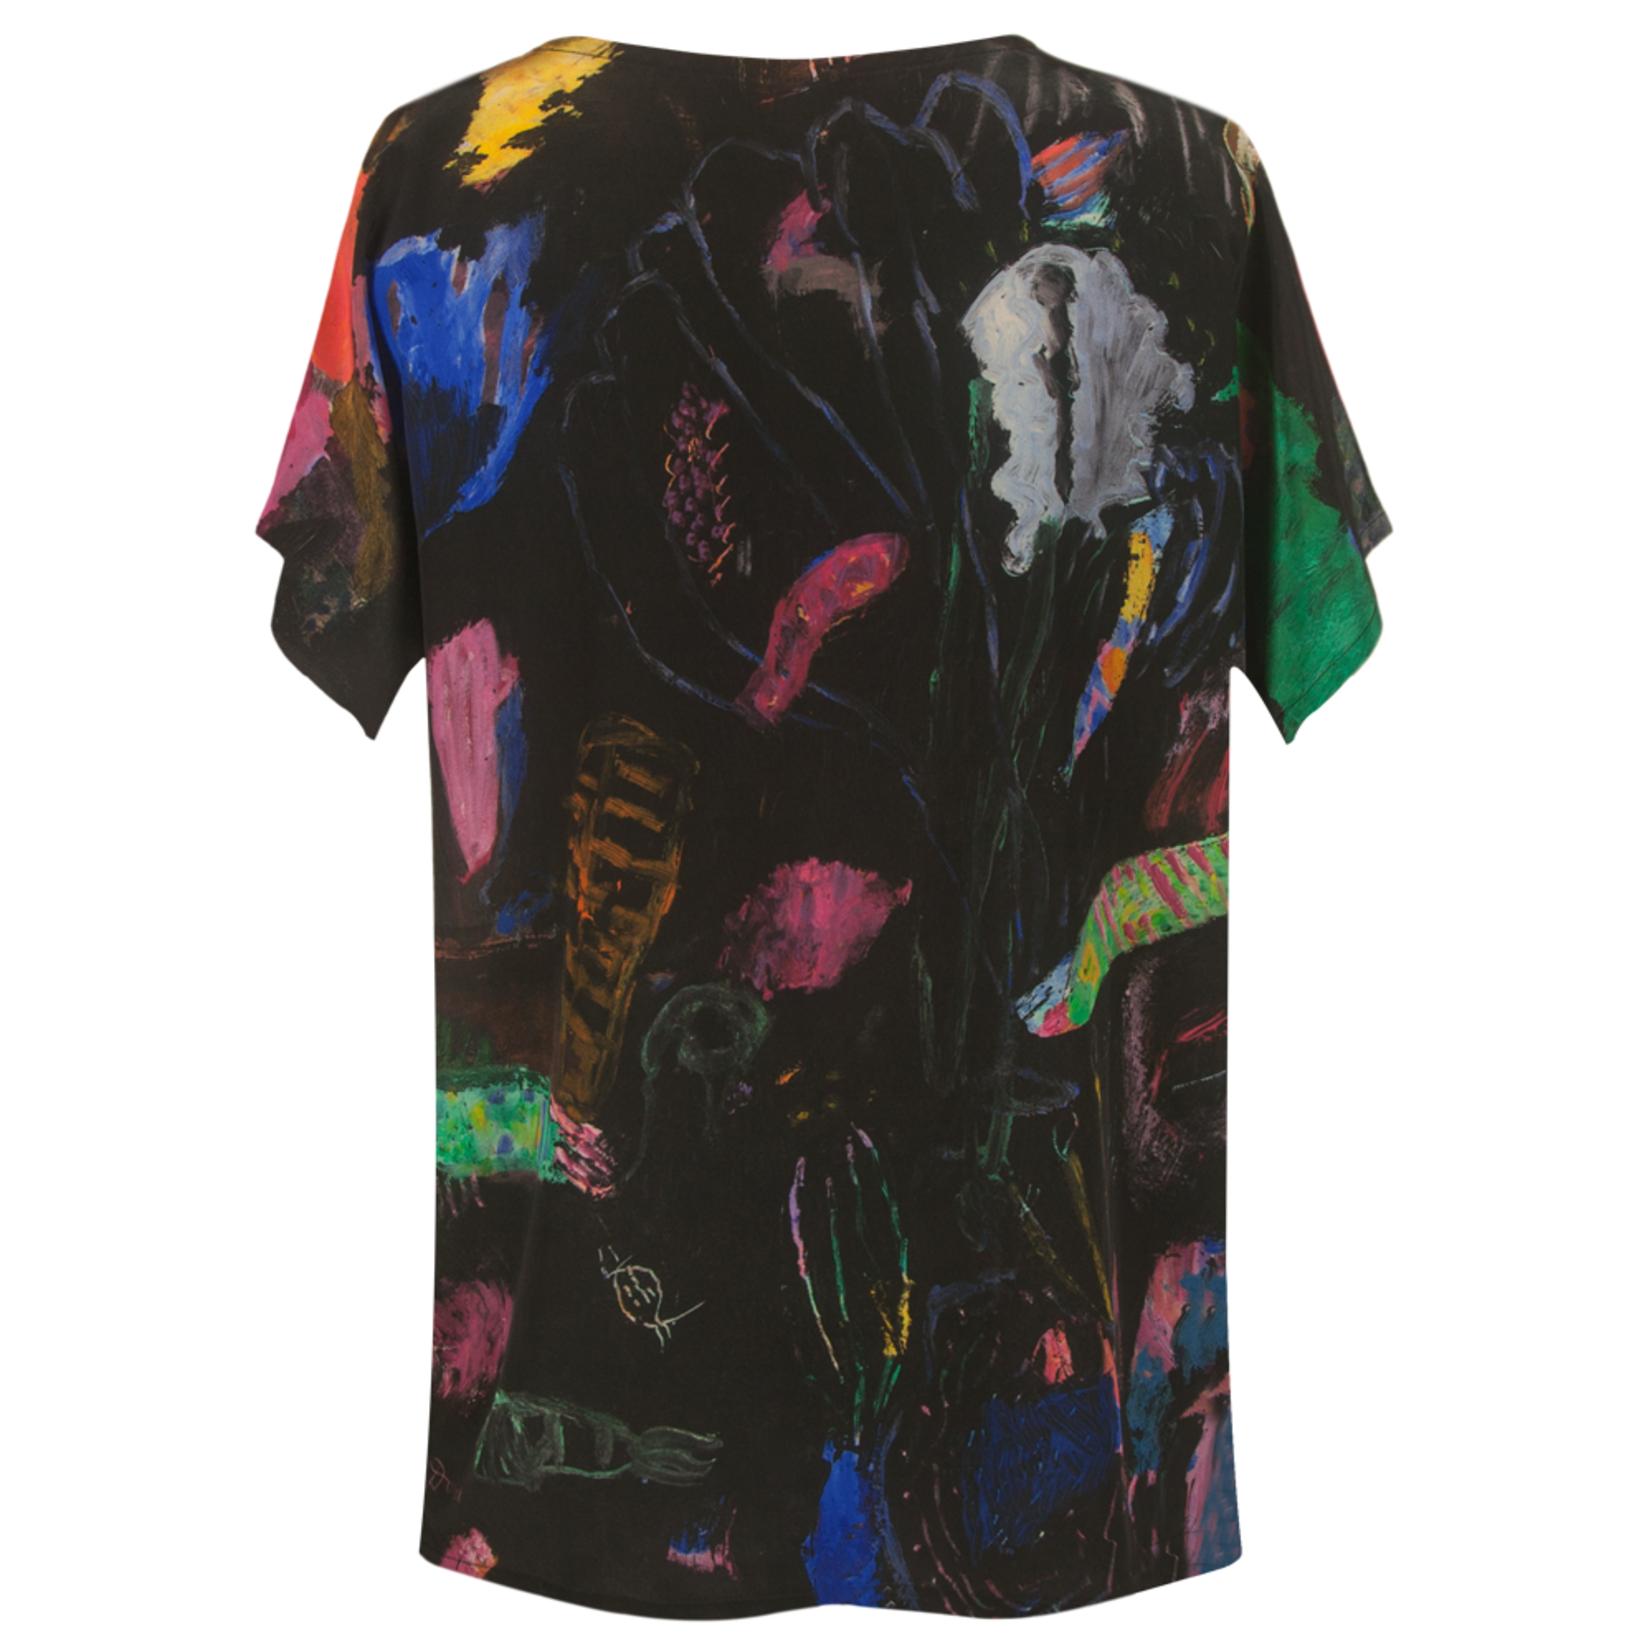 Clothing Art top silk - Night dive